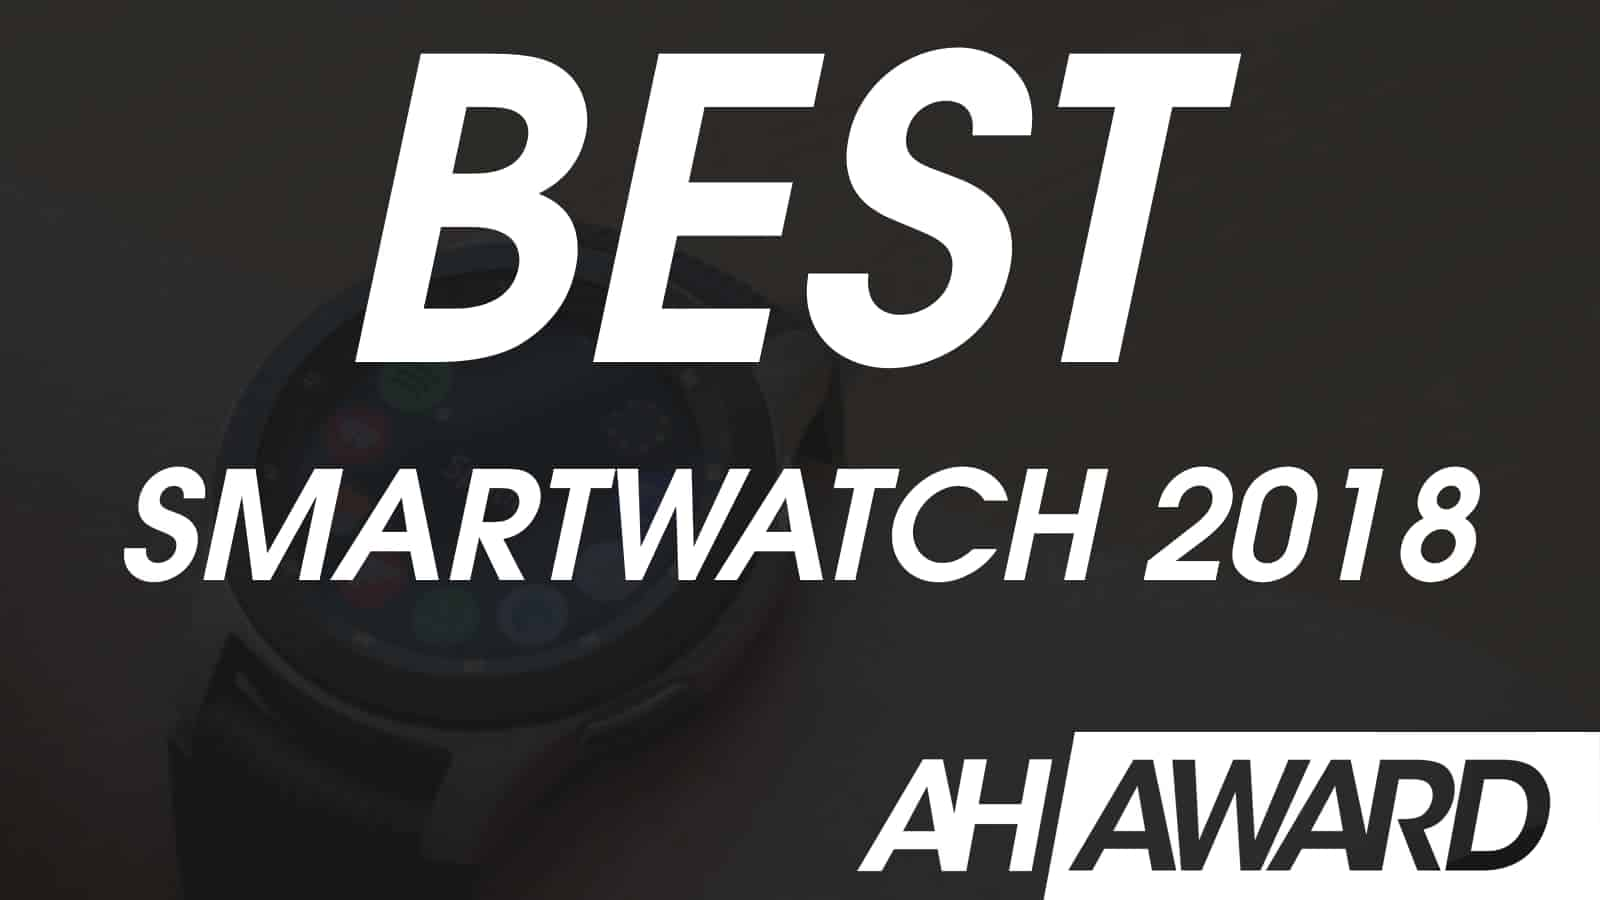 ANDROID HEADLINES AWARDS BEST SMARTWATCH 2018